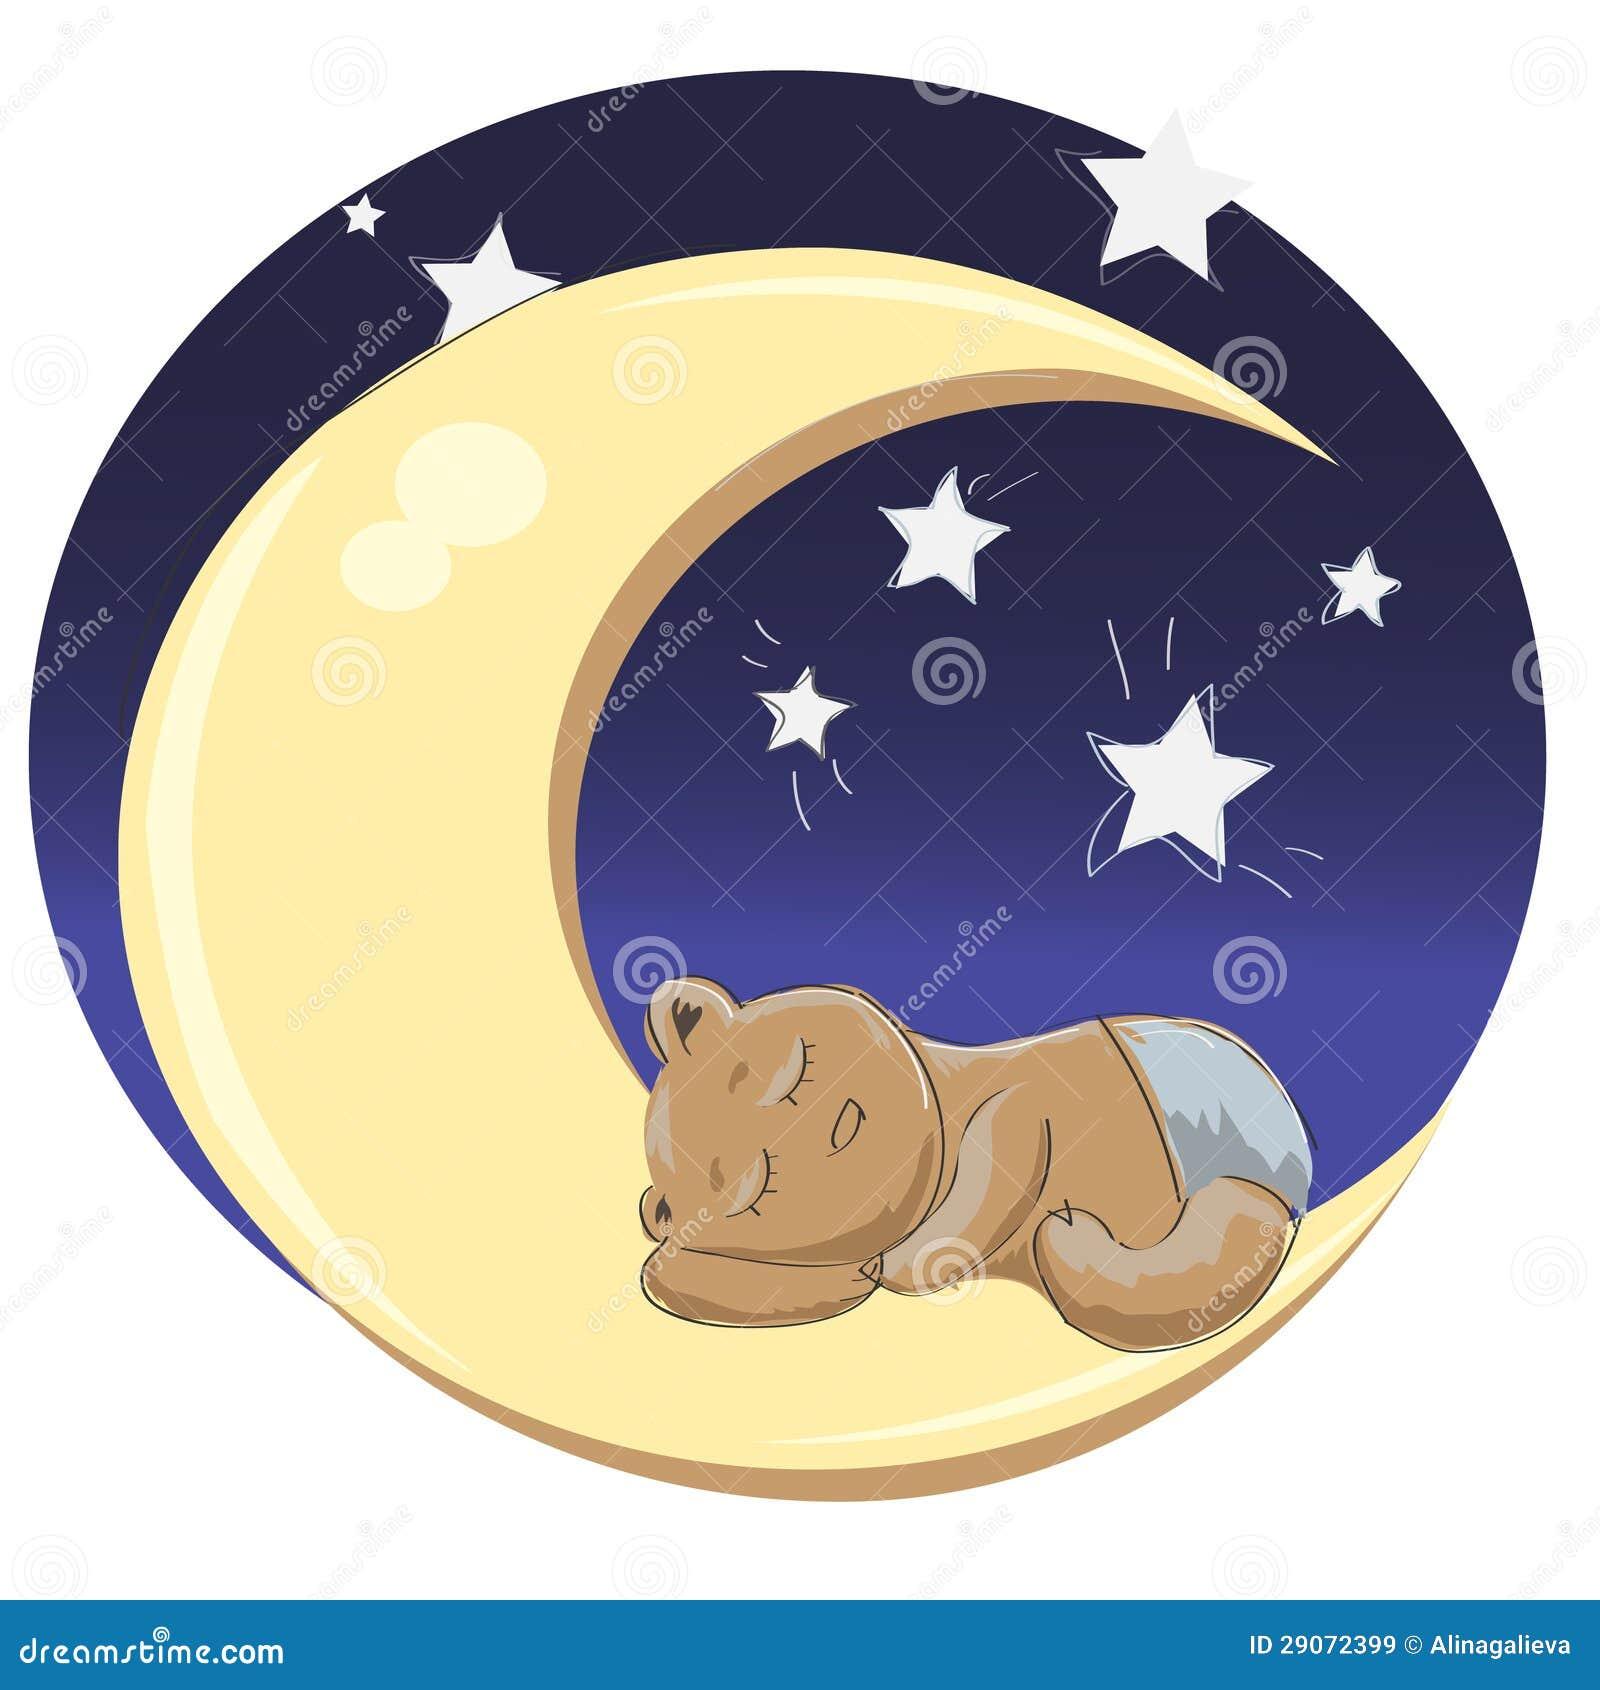 sleeping teddy bear boy stock vector illustration of adorable